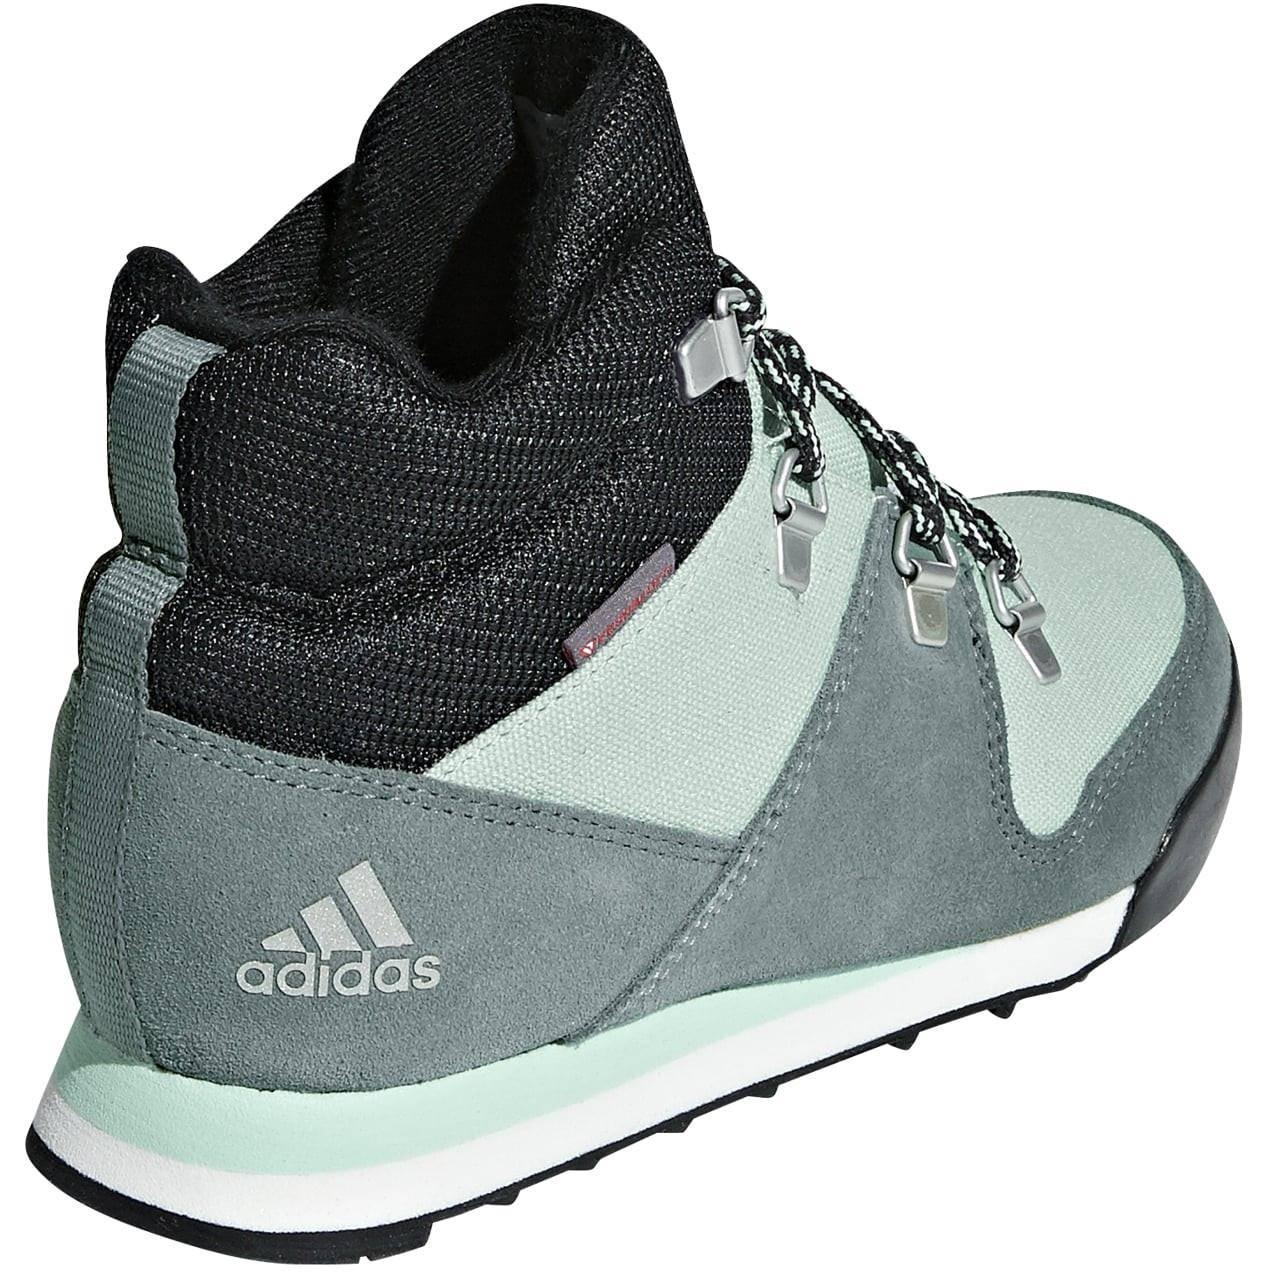 Buty adidas Climawarm Snowpitch AC7962